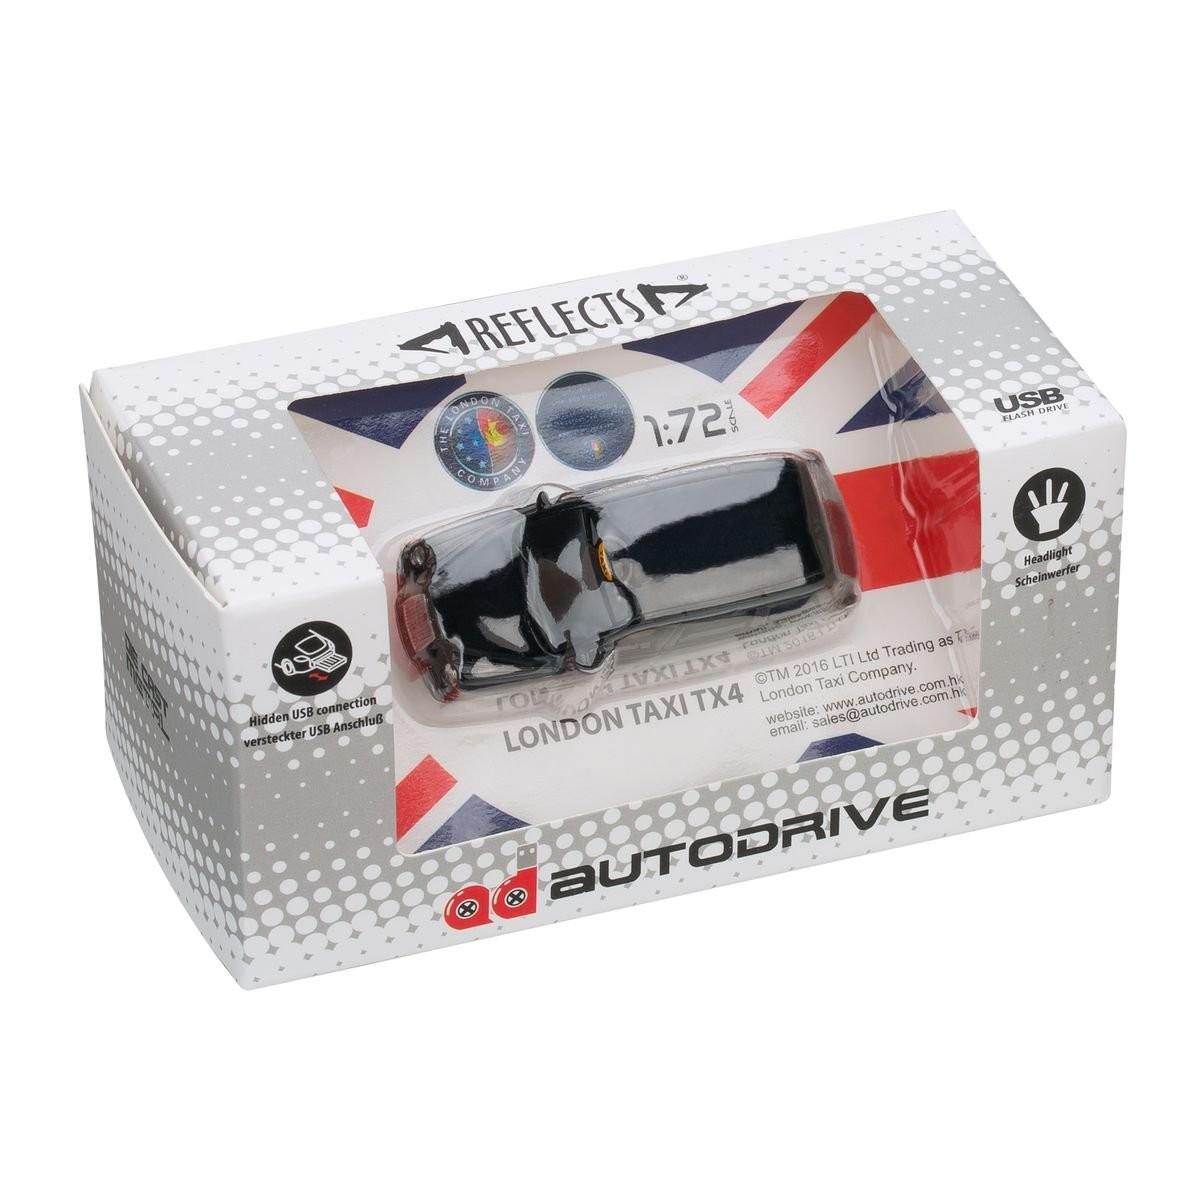 USB-Speicherstick London Taxi TX4 1:72 BLACK 16GB, Ansicht 9